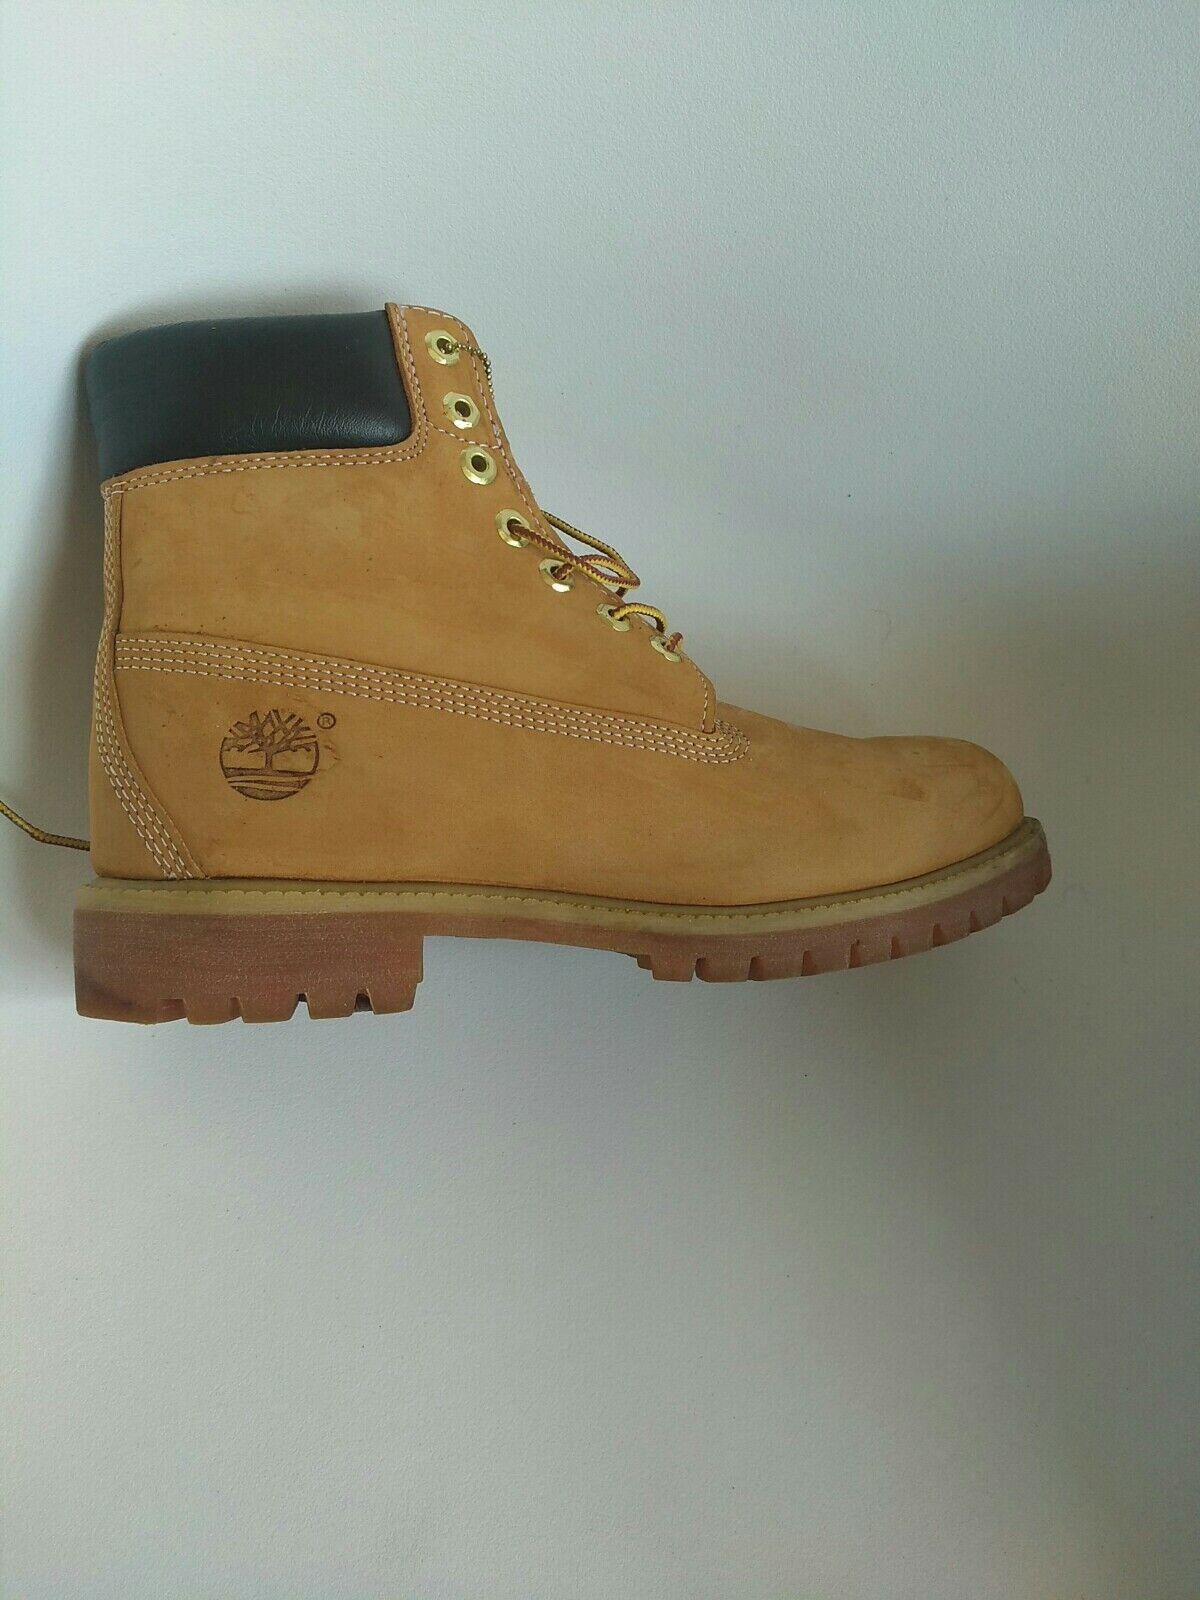 Timberland mens boots size 9 Premium Wheat Nubuck sample edition waterproof